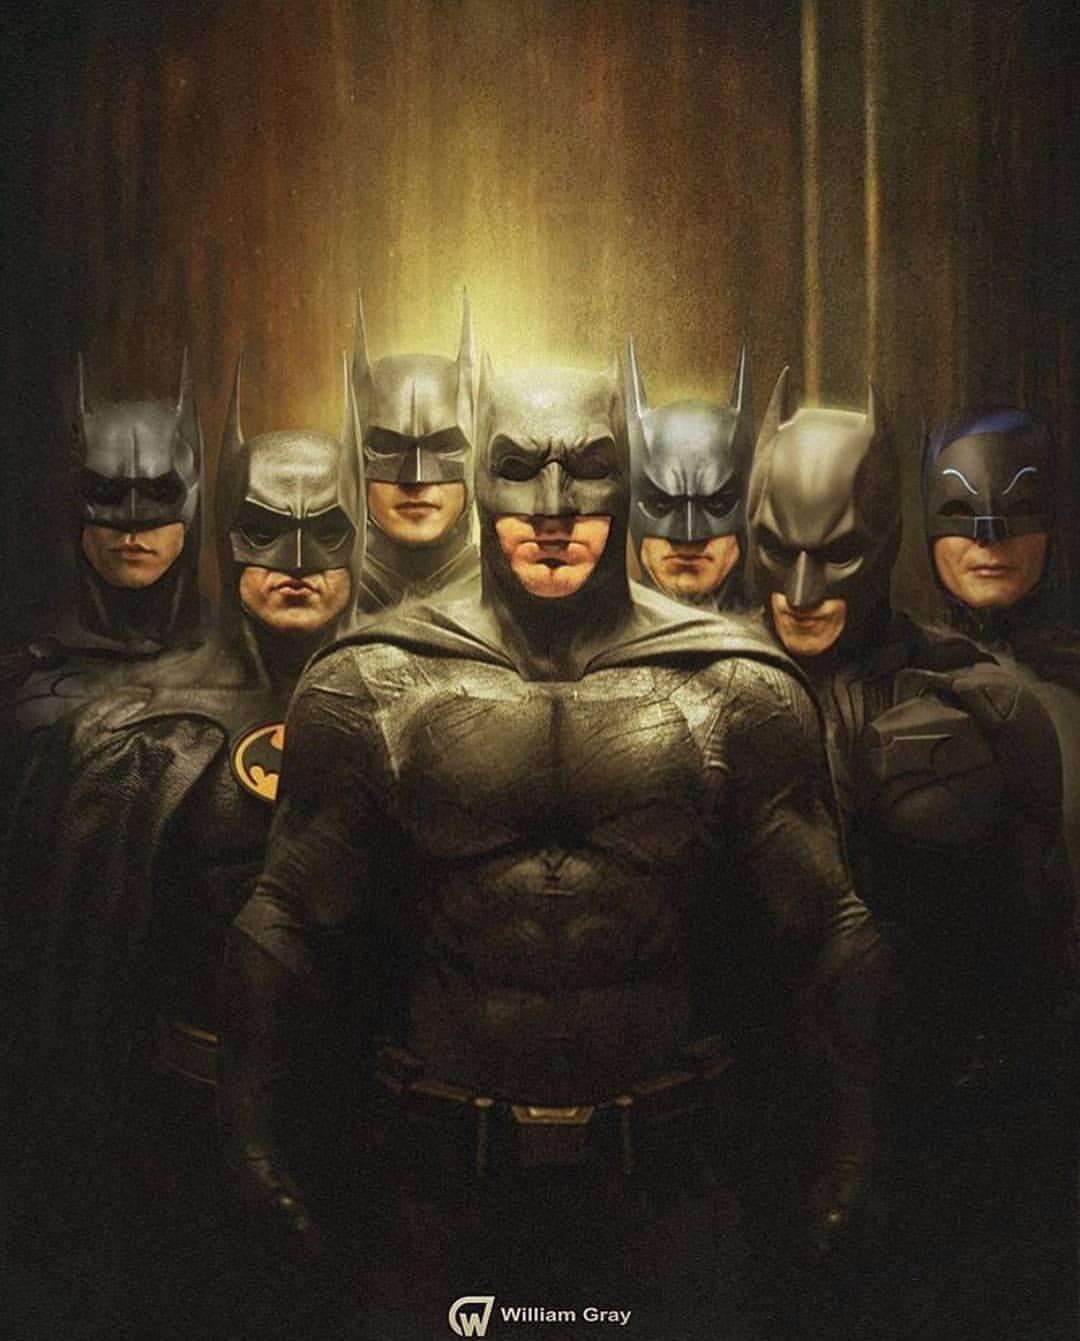 Psychology of Bruce Wayne 413ead2ab0f00fb6caac056135c90a1b